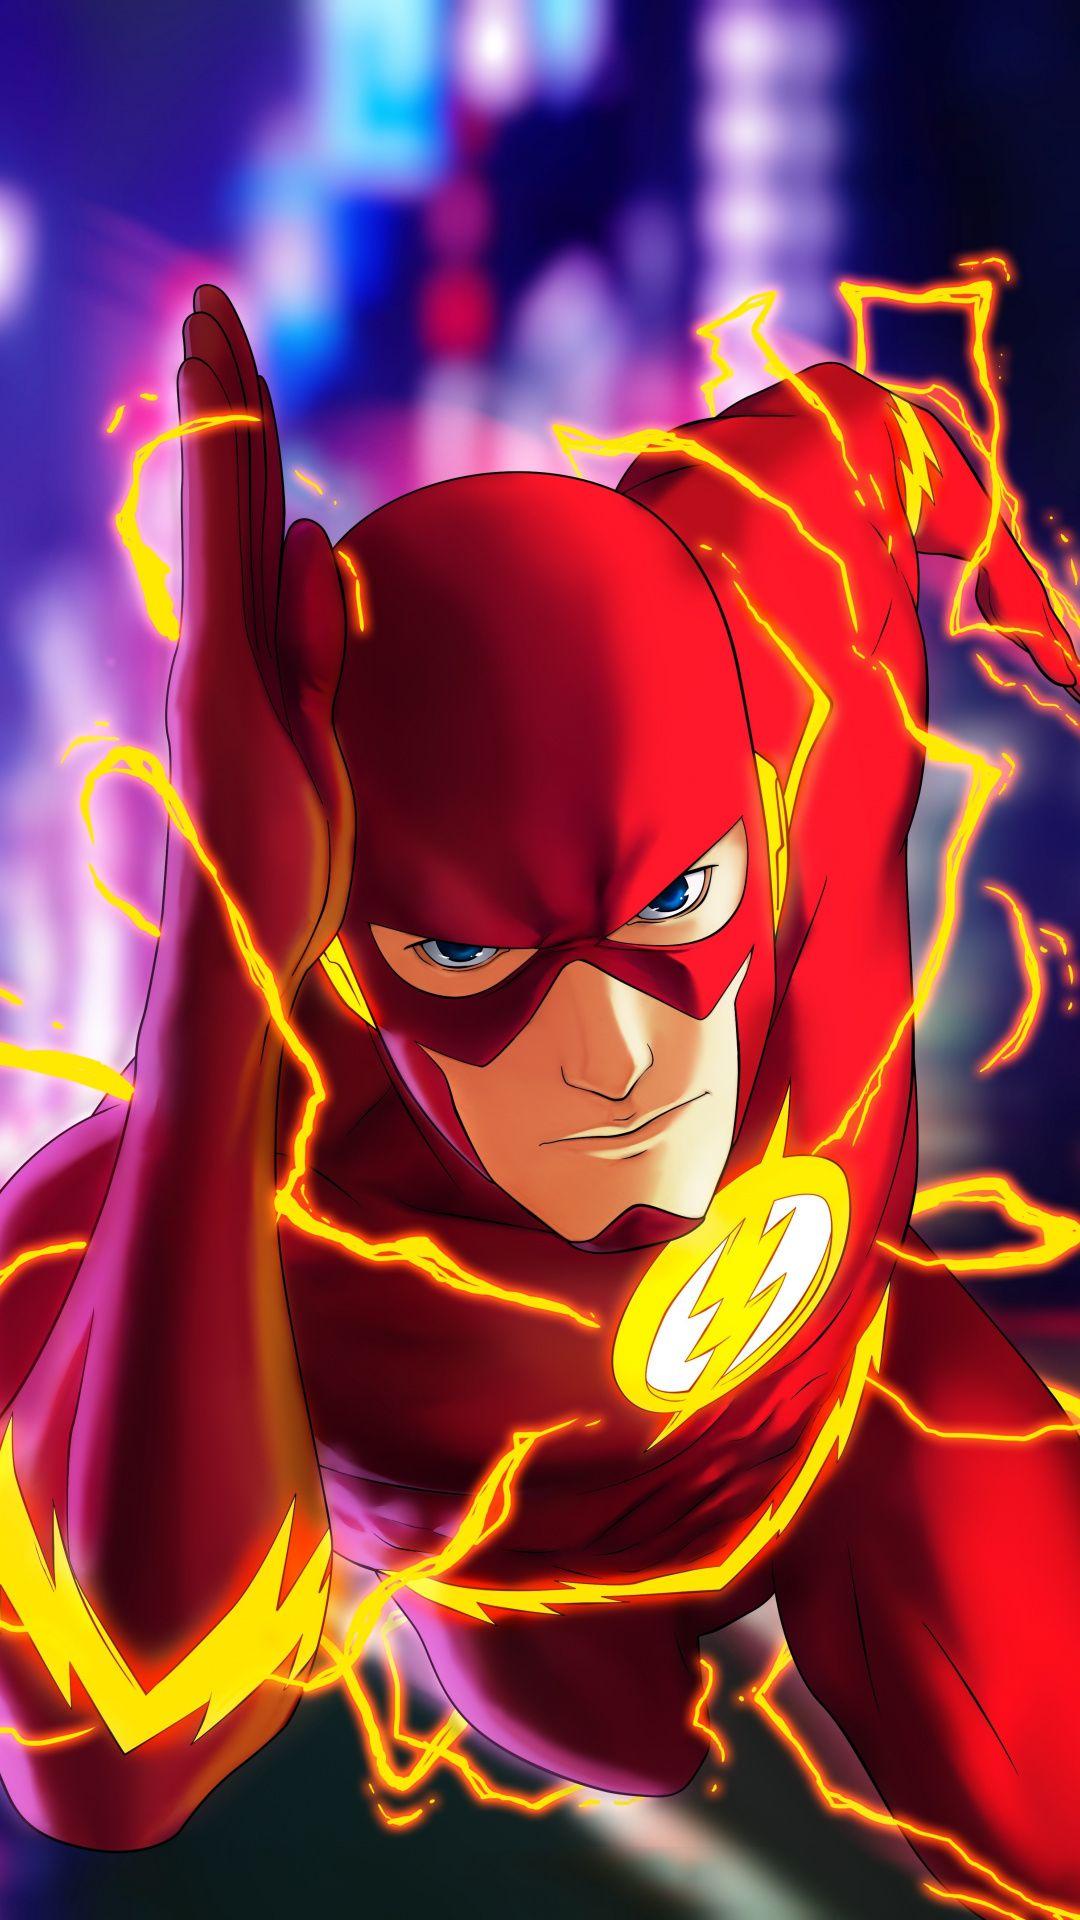 Flash Run Fast Superhero Dc Comics Art 1080x1920 Wallpaper Flash Comics Dc Comics Art Flash Wallpaper Flash phone wallpaper hd